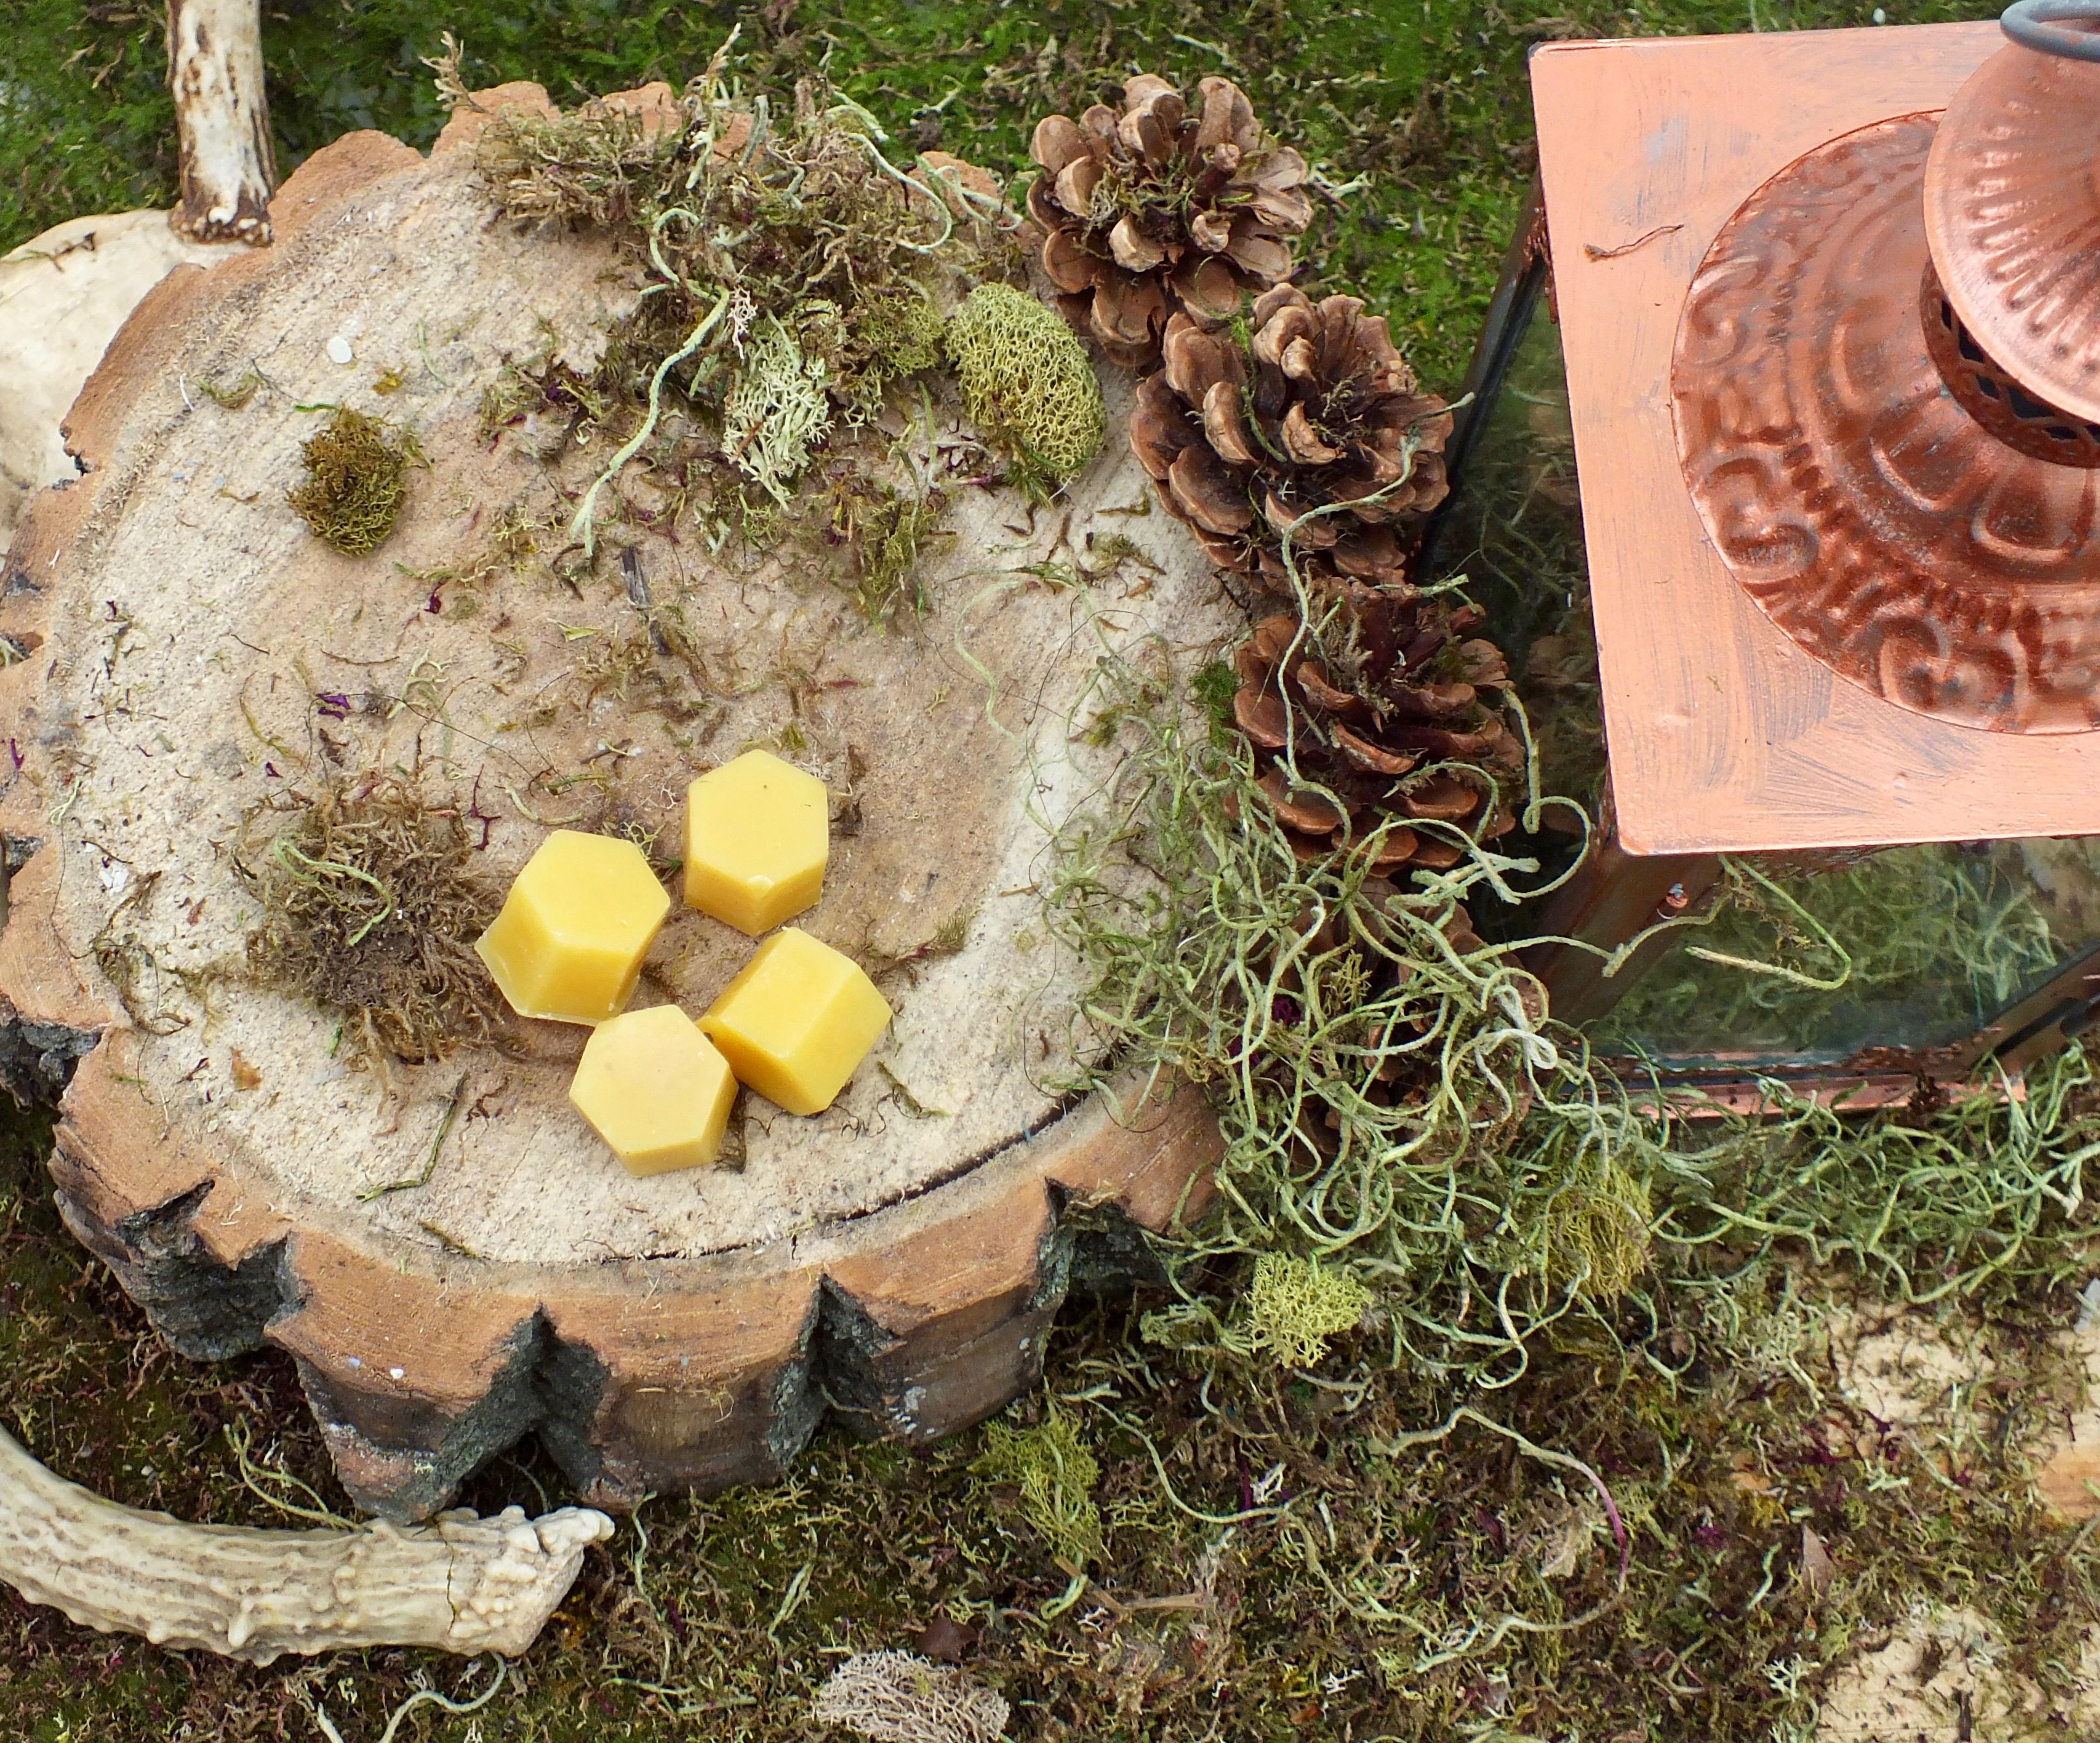 beeswax hexagon shape for herbal learnin